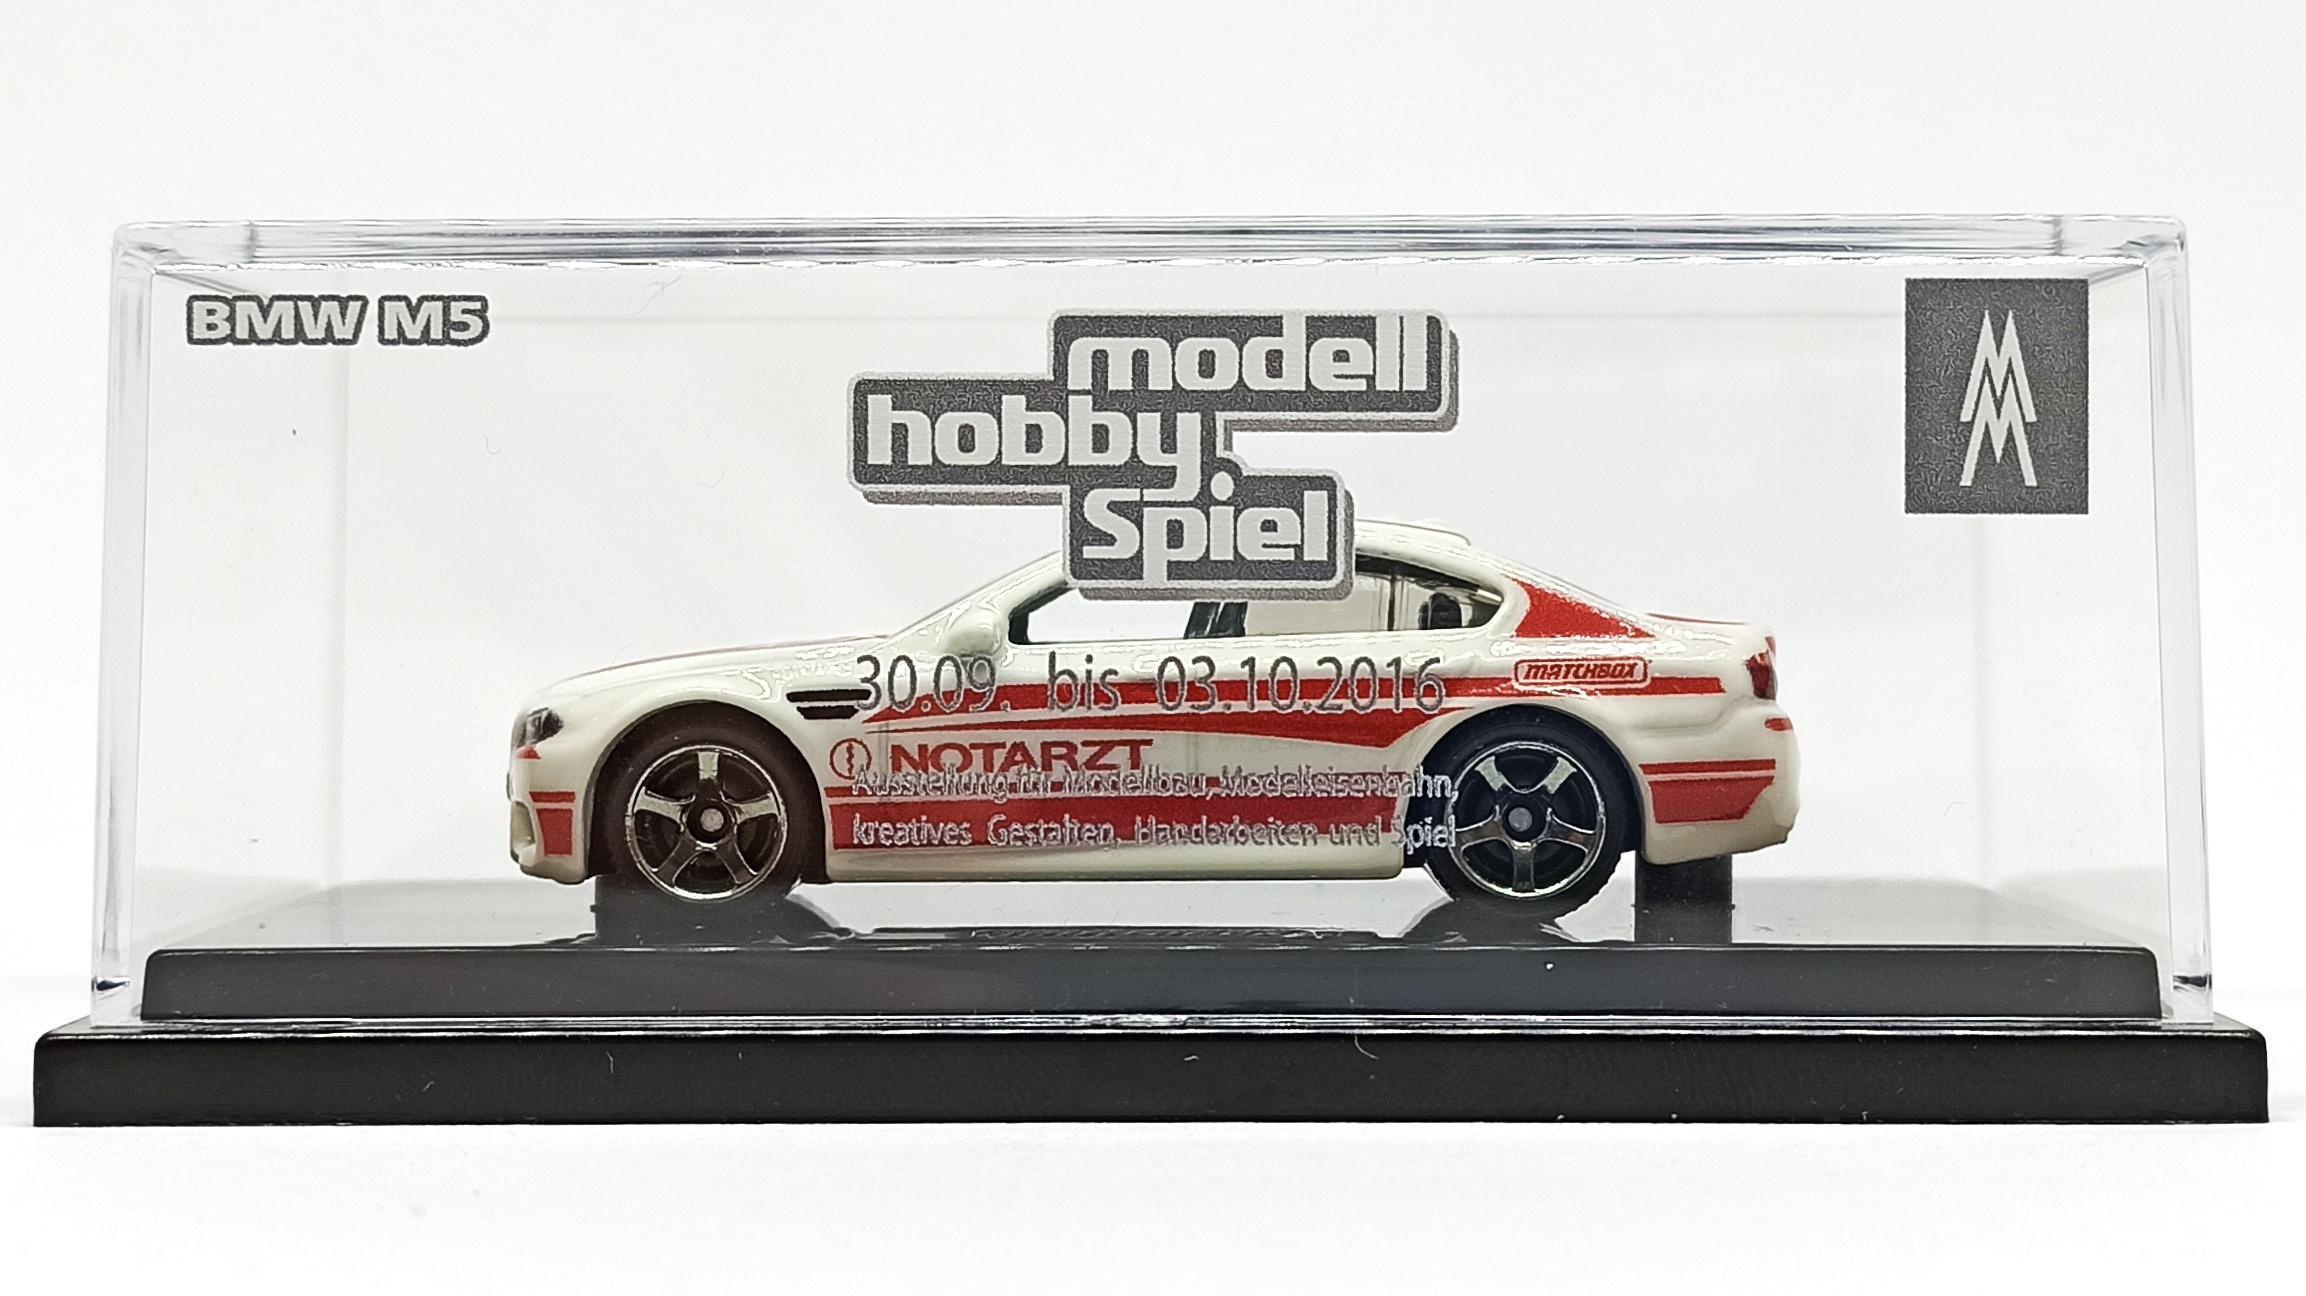 "Matchbox BMW M5 Police 2016 Toy Fair ""Modell Hobby Spiel"" Leipzig white MBX Notarzt side acryl display case"